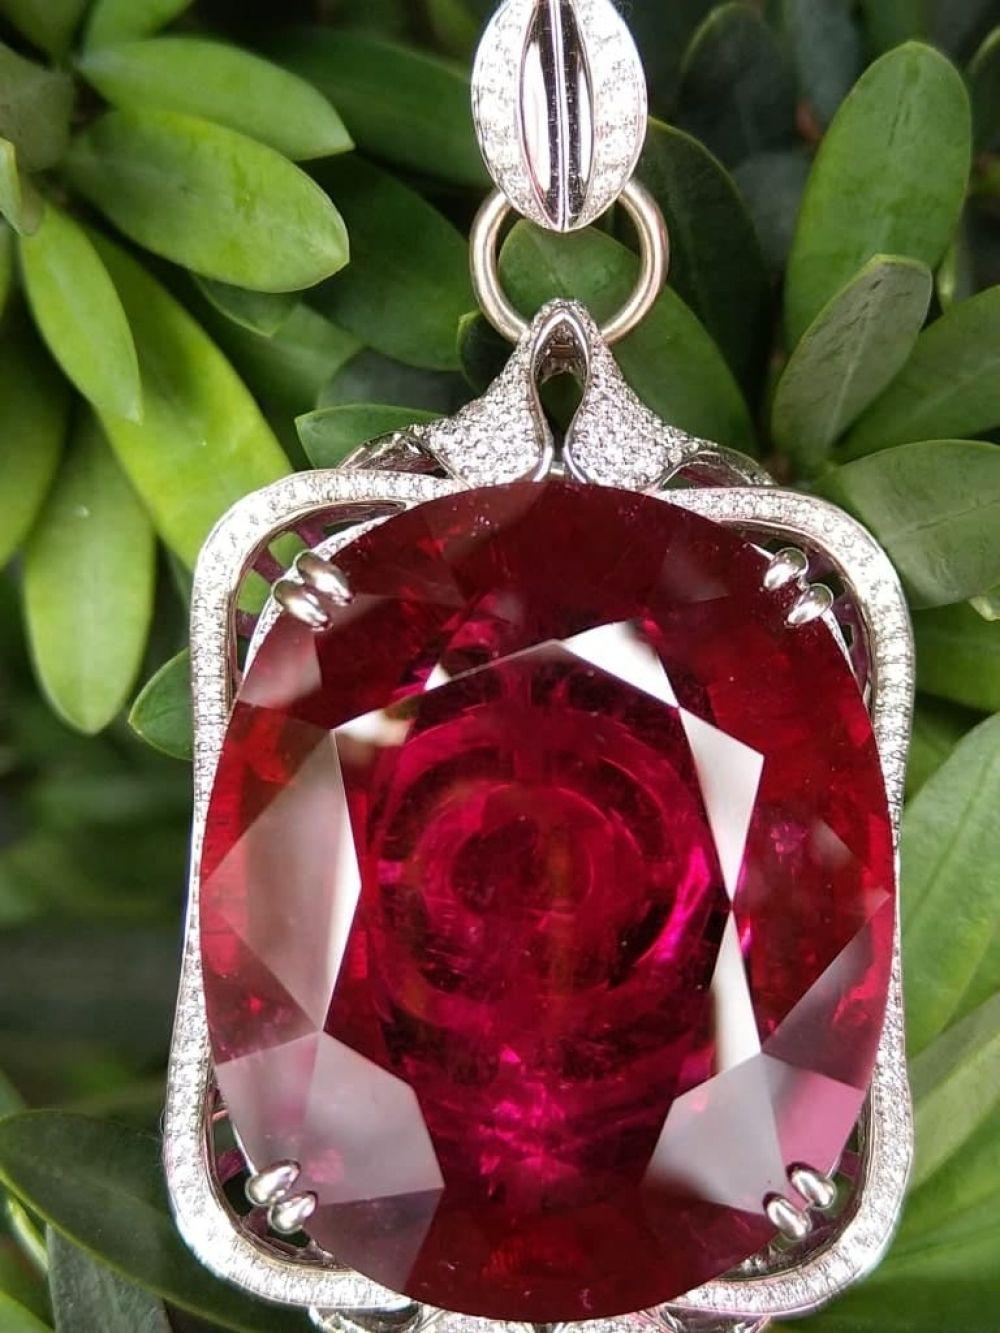 [$31938] 18K Rubilite Pendant Oval 90.03 Cts @minigrinlv  #exclusivejewelry #highendjewellery #highendjewelry #luxuryjewellery #luxuryjewelry #pendant